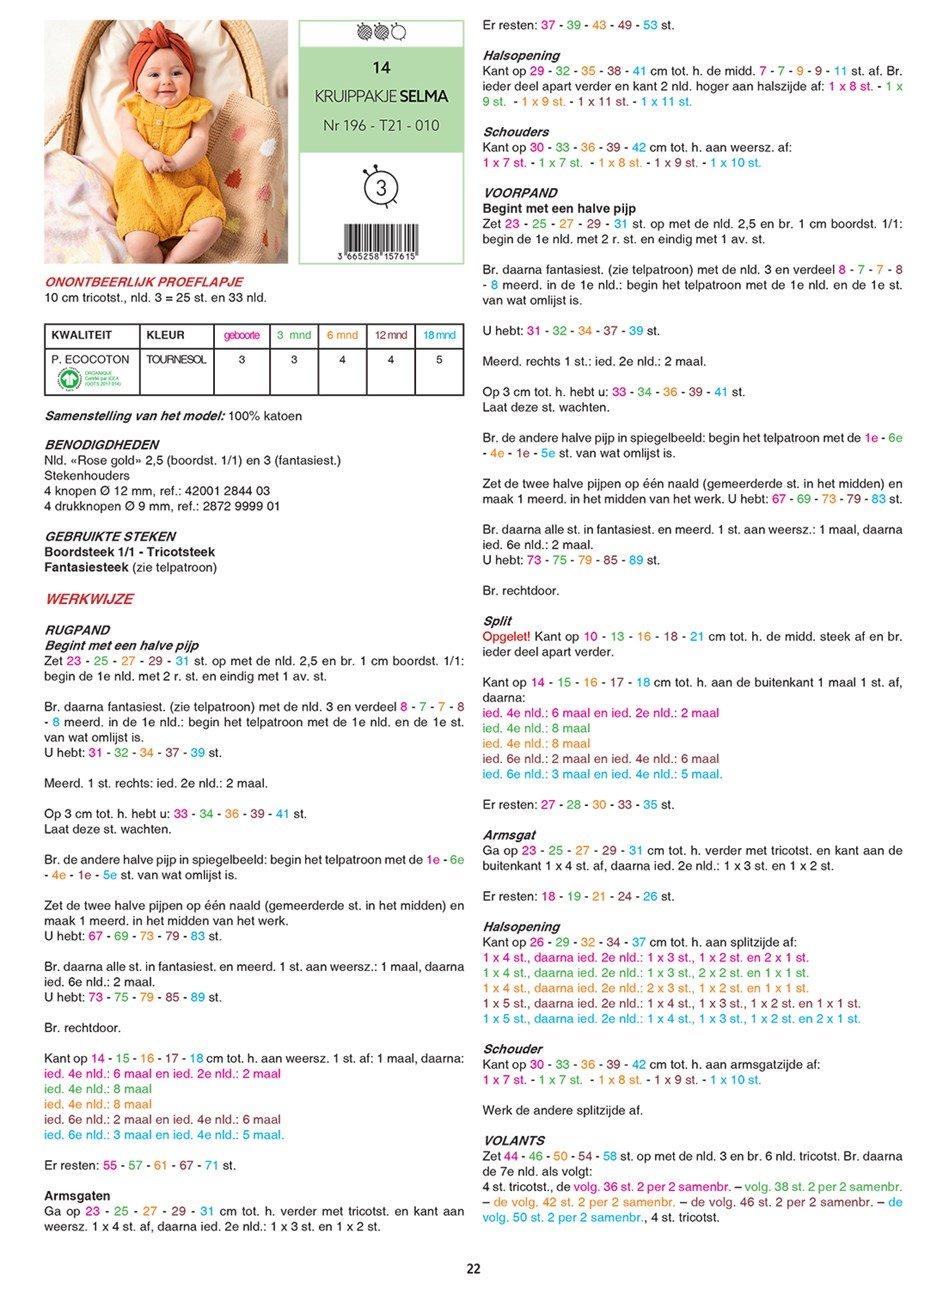 Gratis patroon - Breipatroon kruippakje